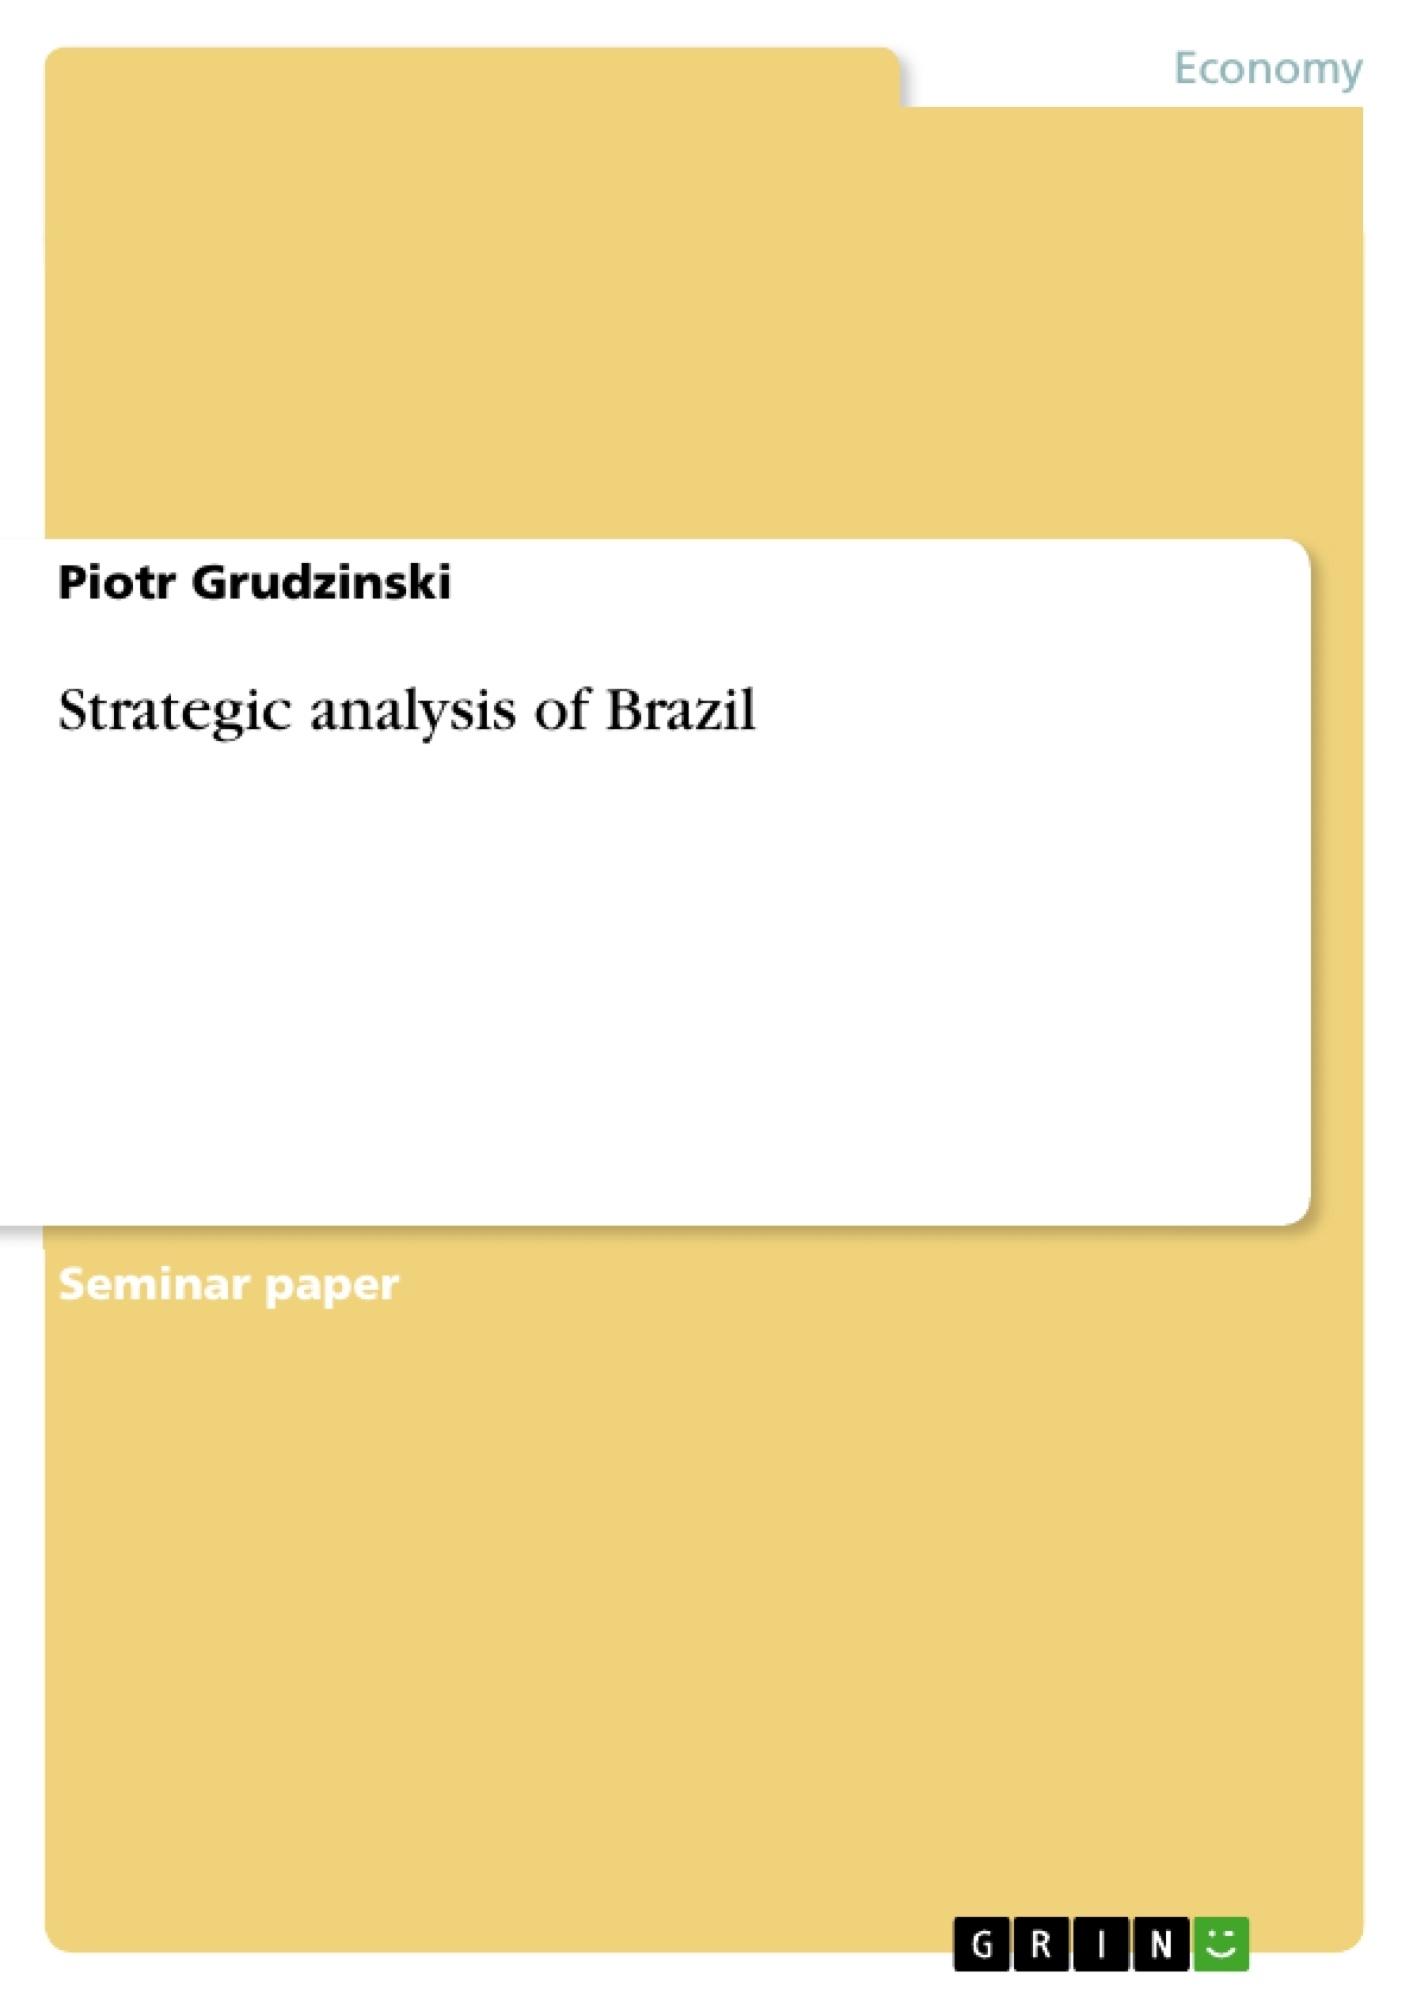 Title: Strategic analysis of Brazil